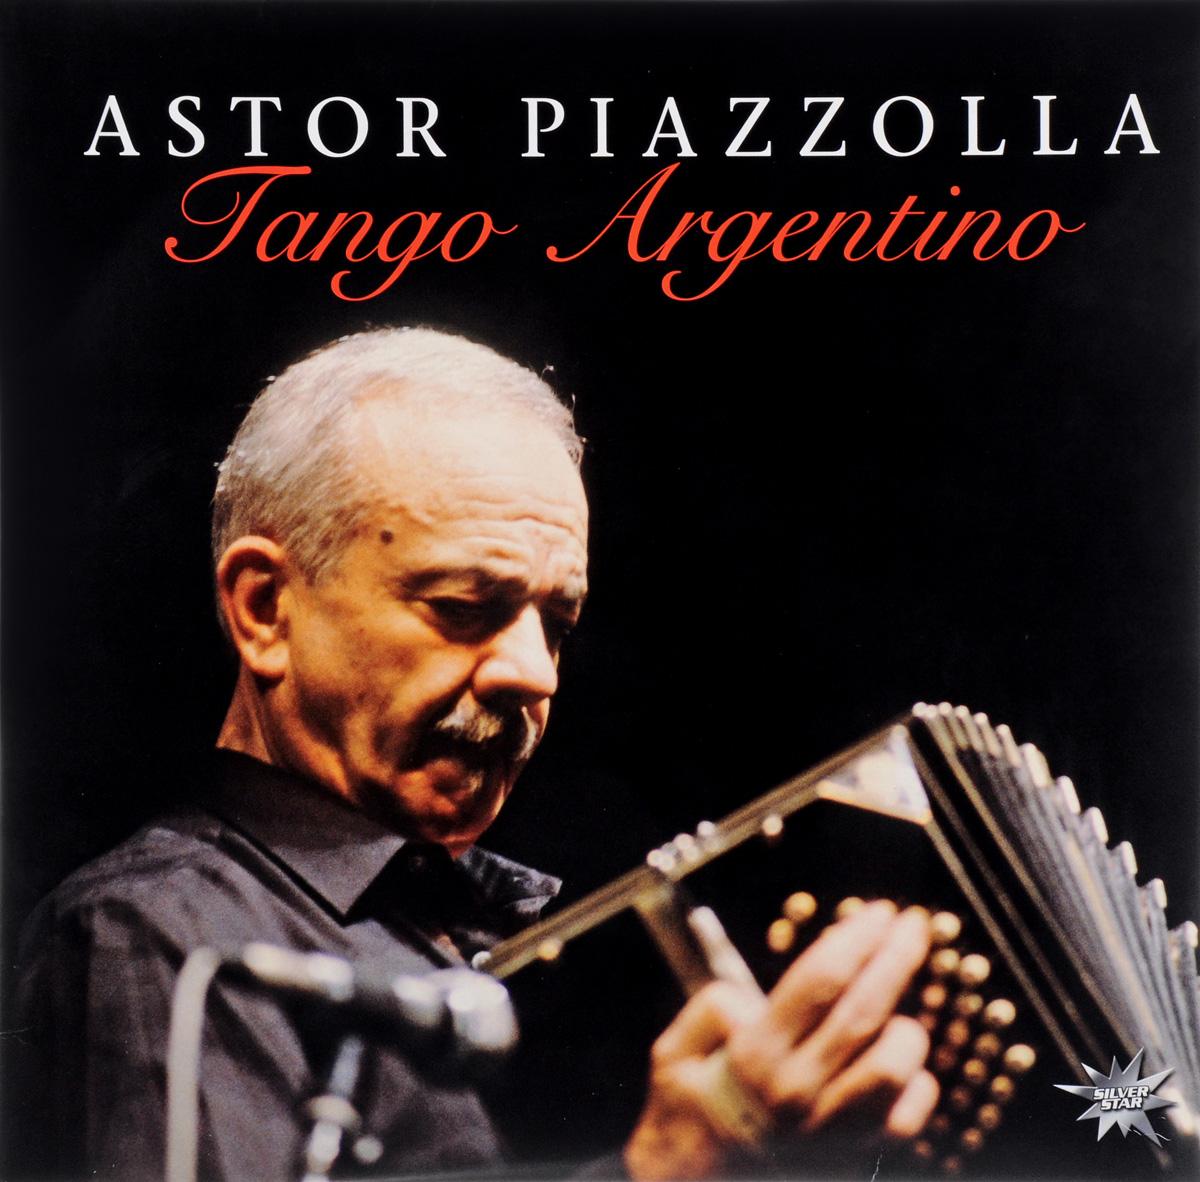 Астор Пьяццолла Astor Piazzola. Tango Argentino (LP)